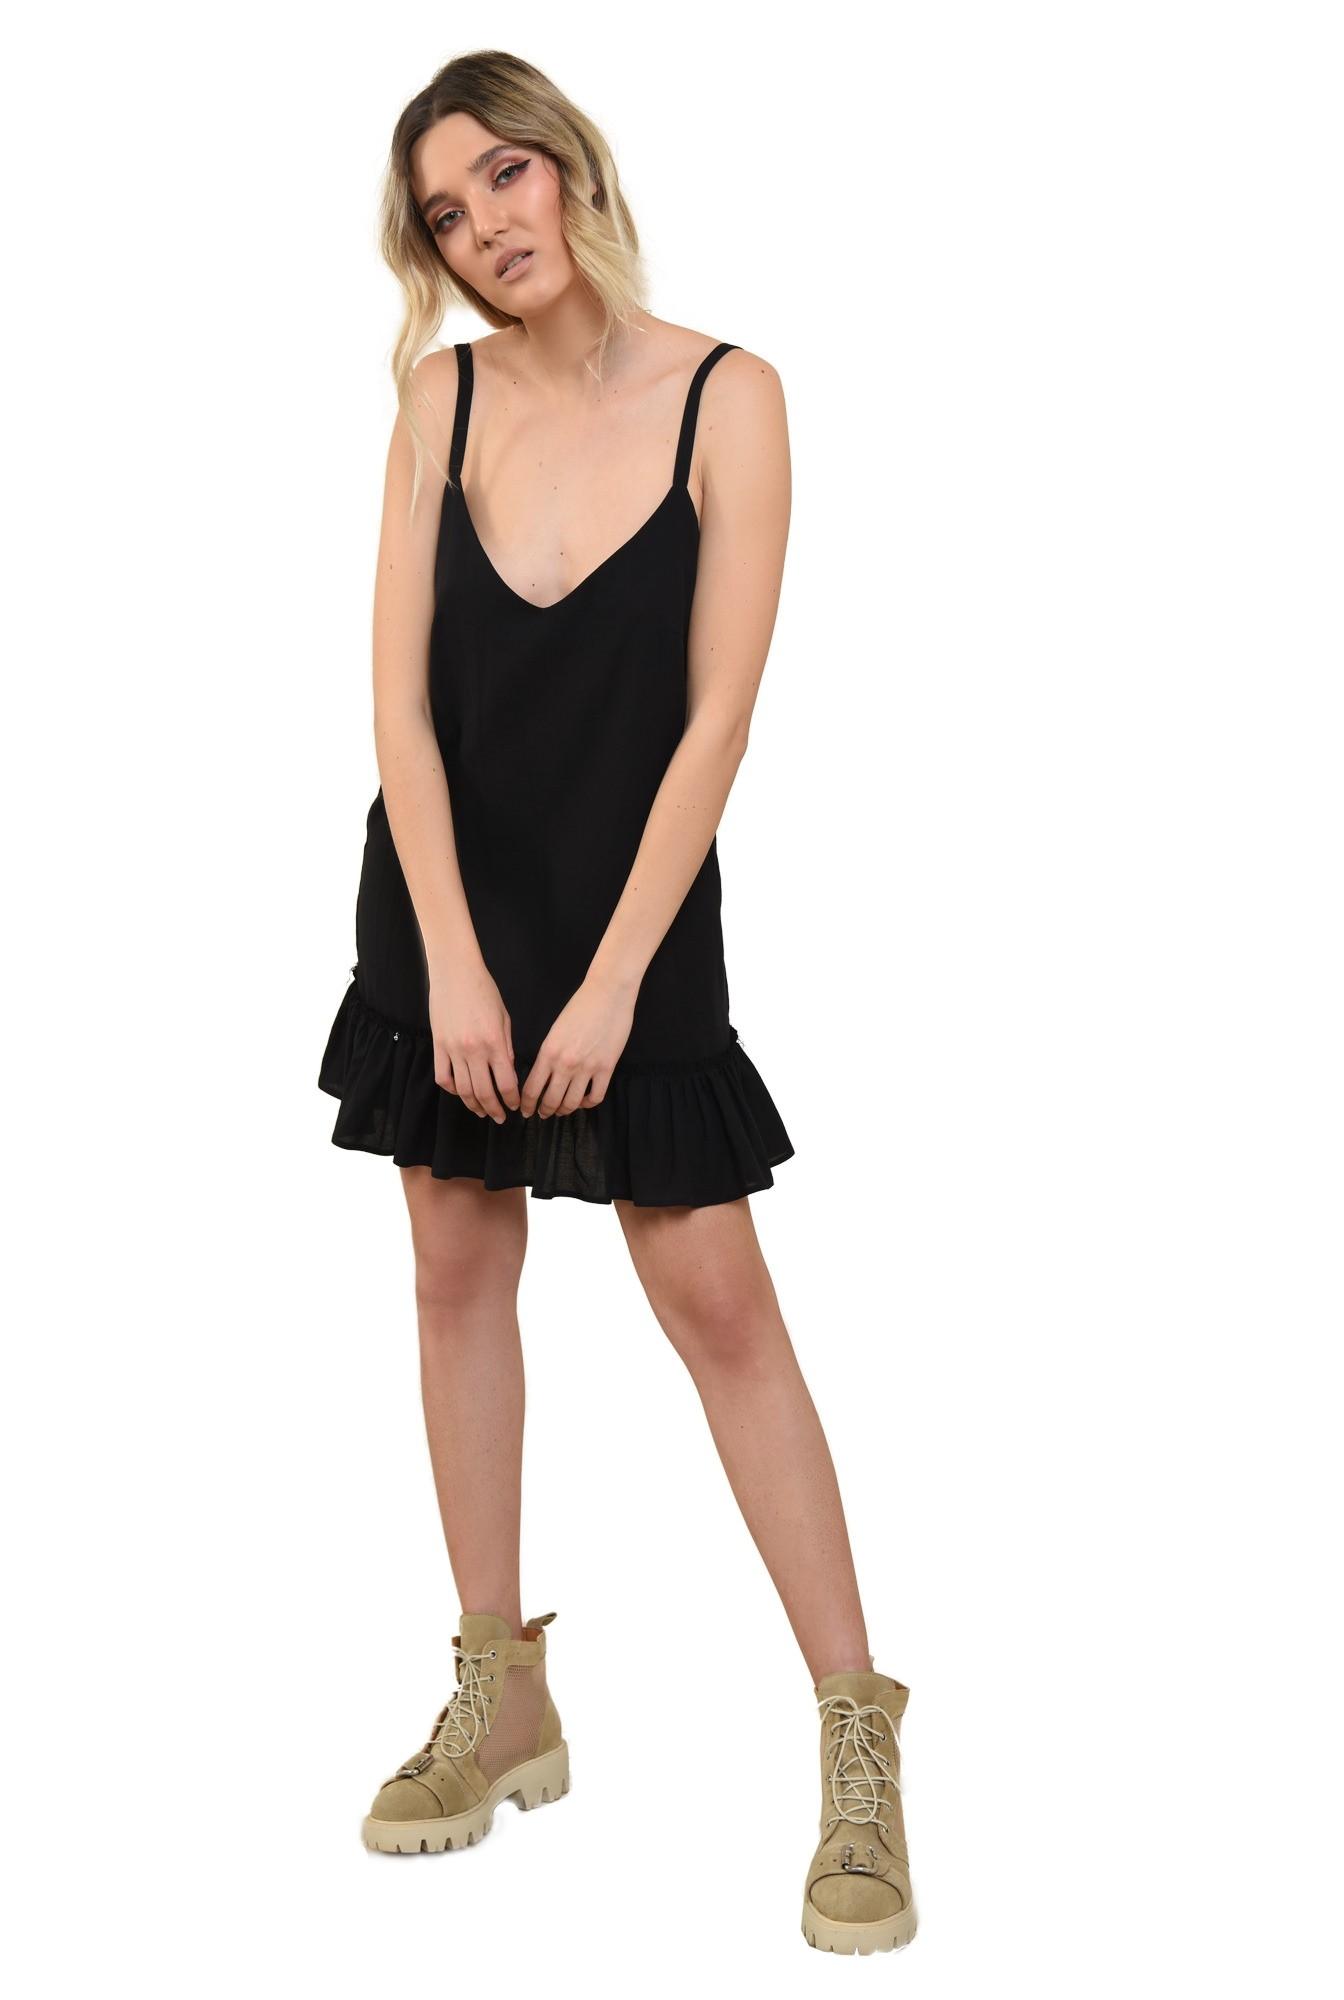 360 -  rochie lejera, cu bretele fine, evazata, scurta, rochie de vara